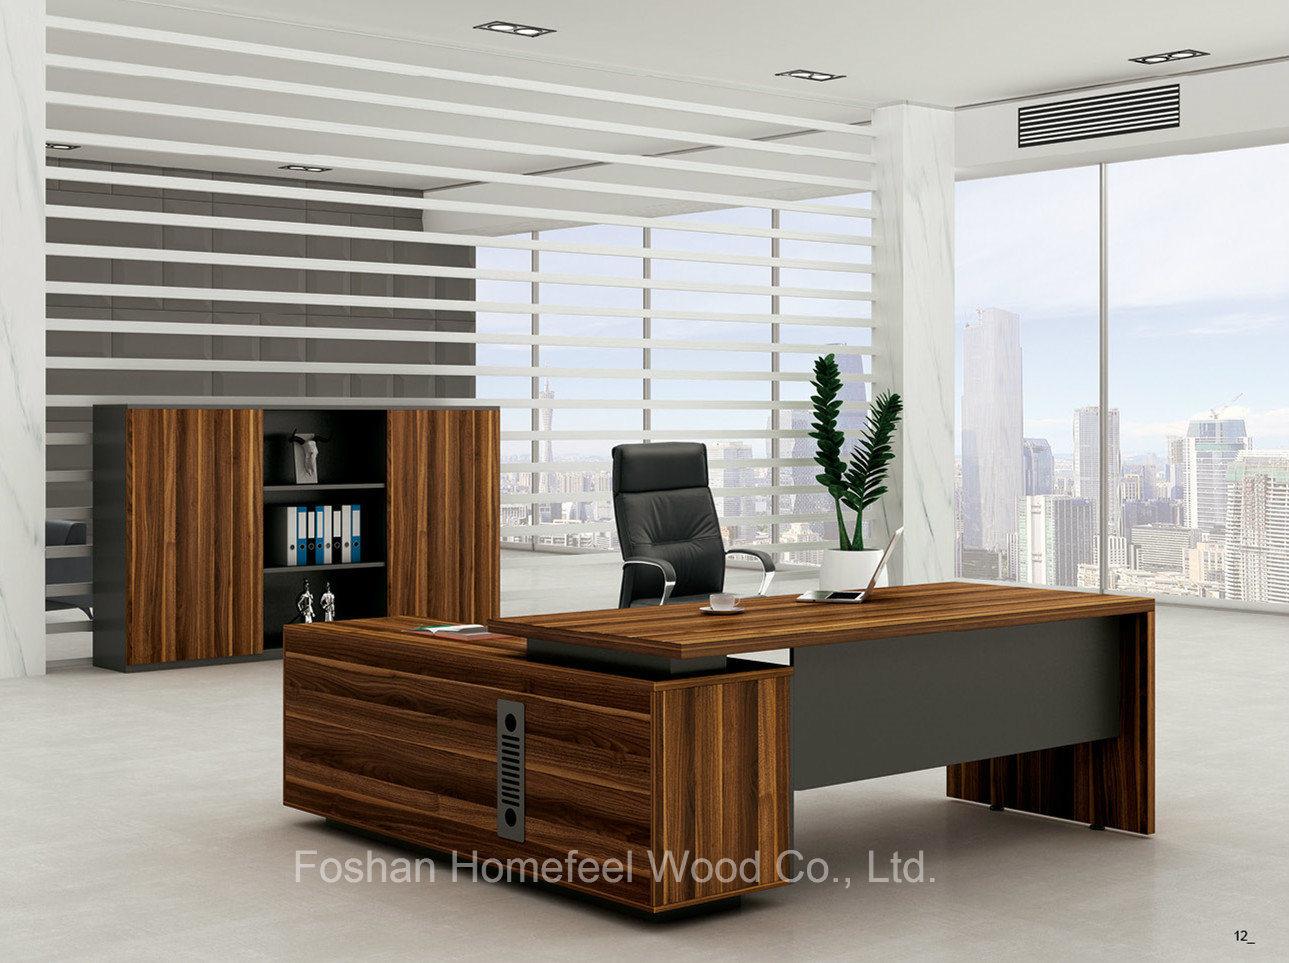 Wooden Melamine Office Furniture Manager Table Executive Desk Hf Fd008